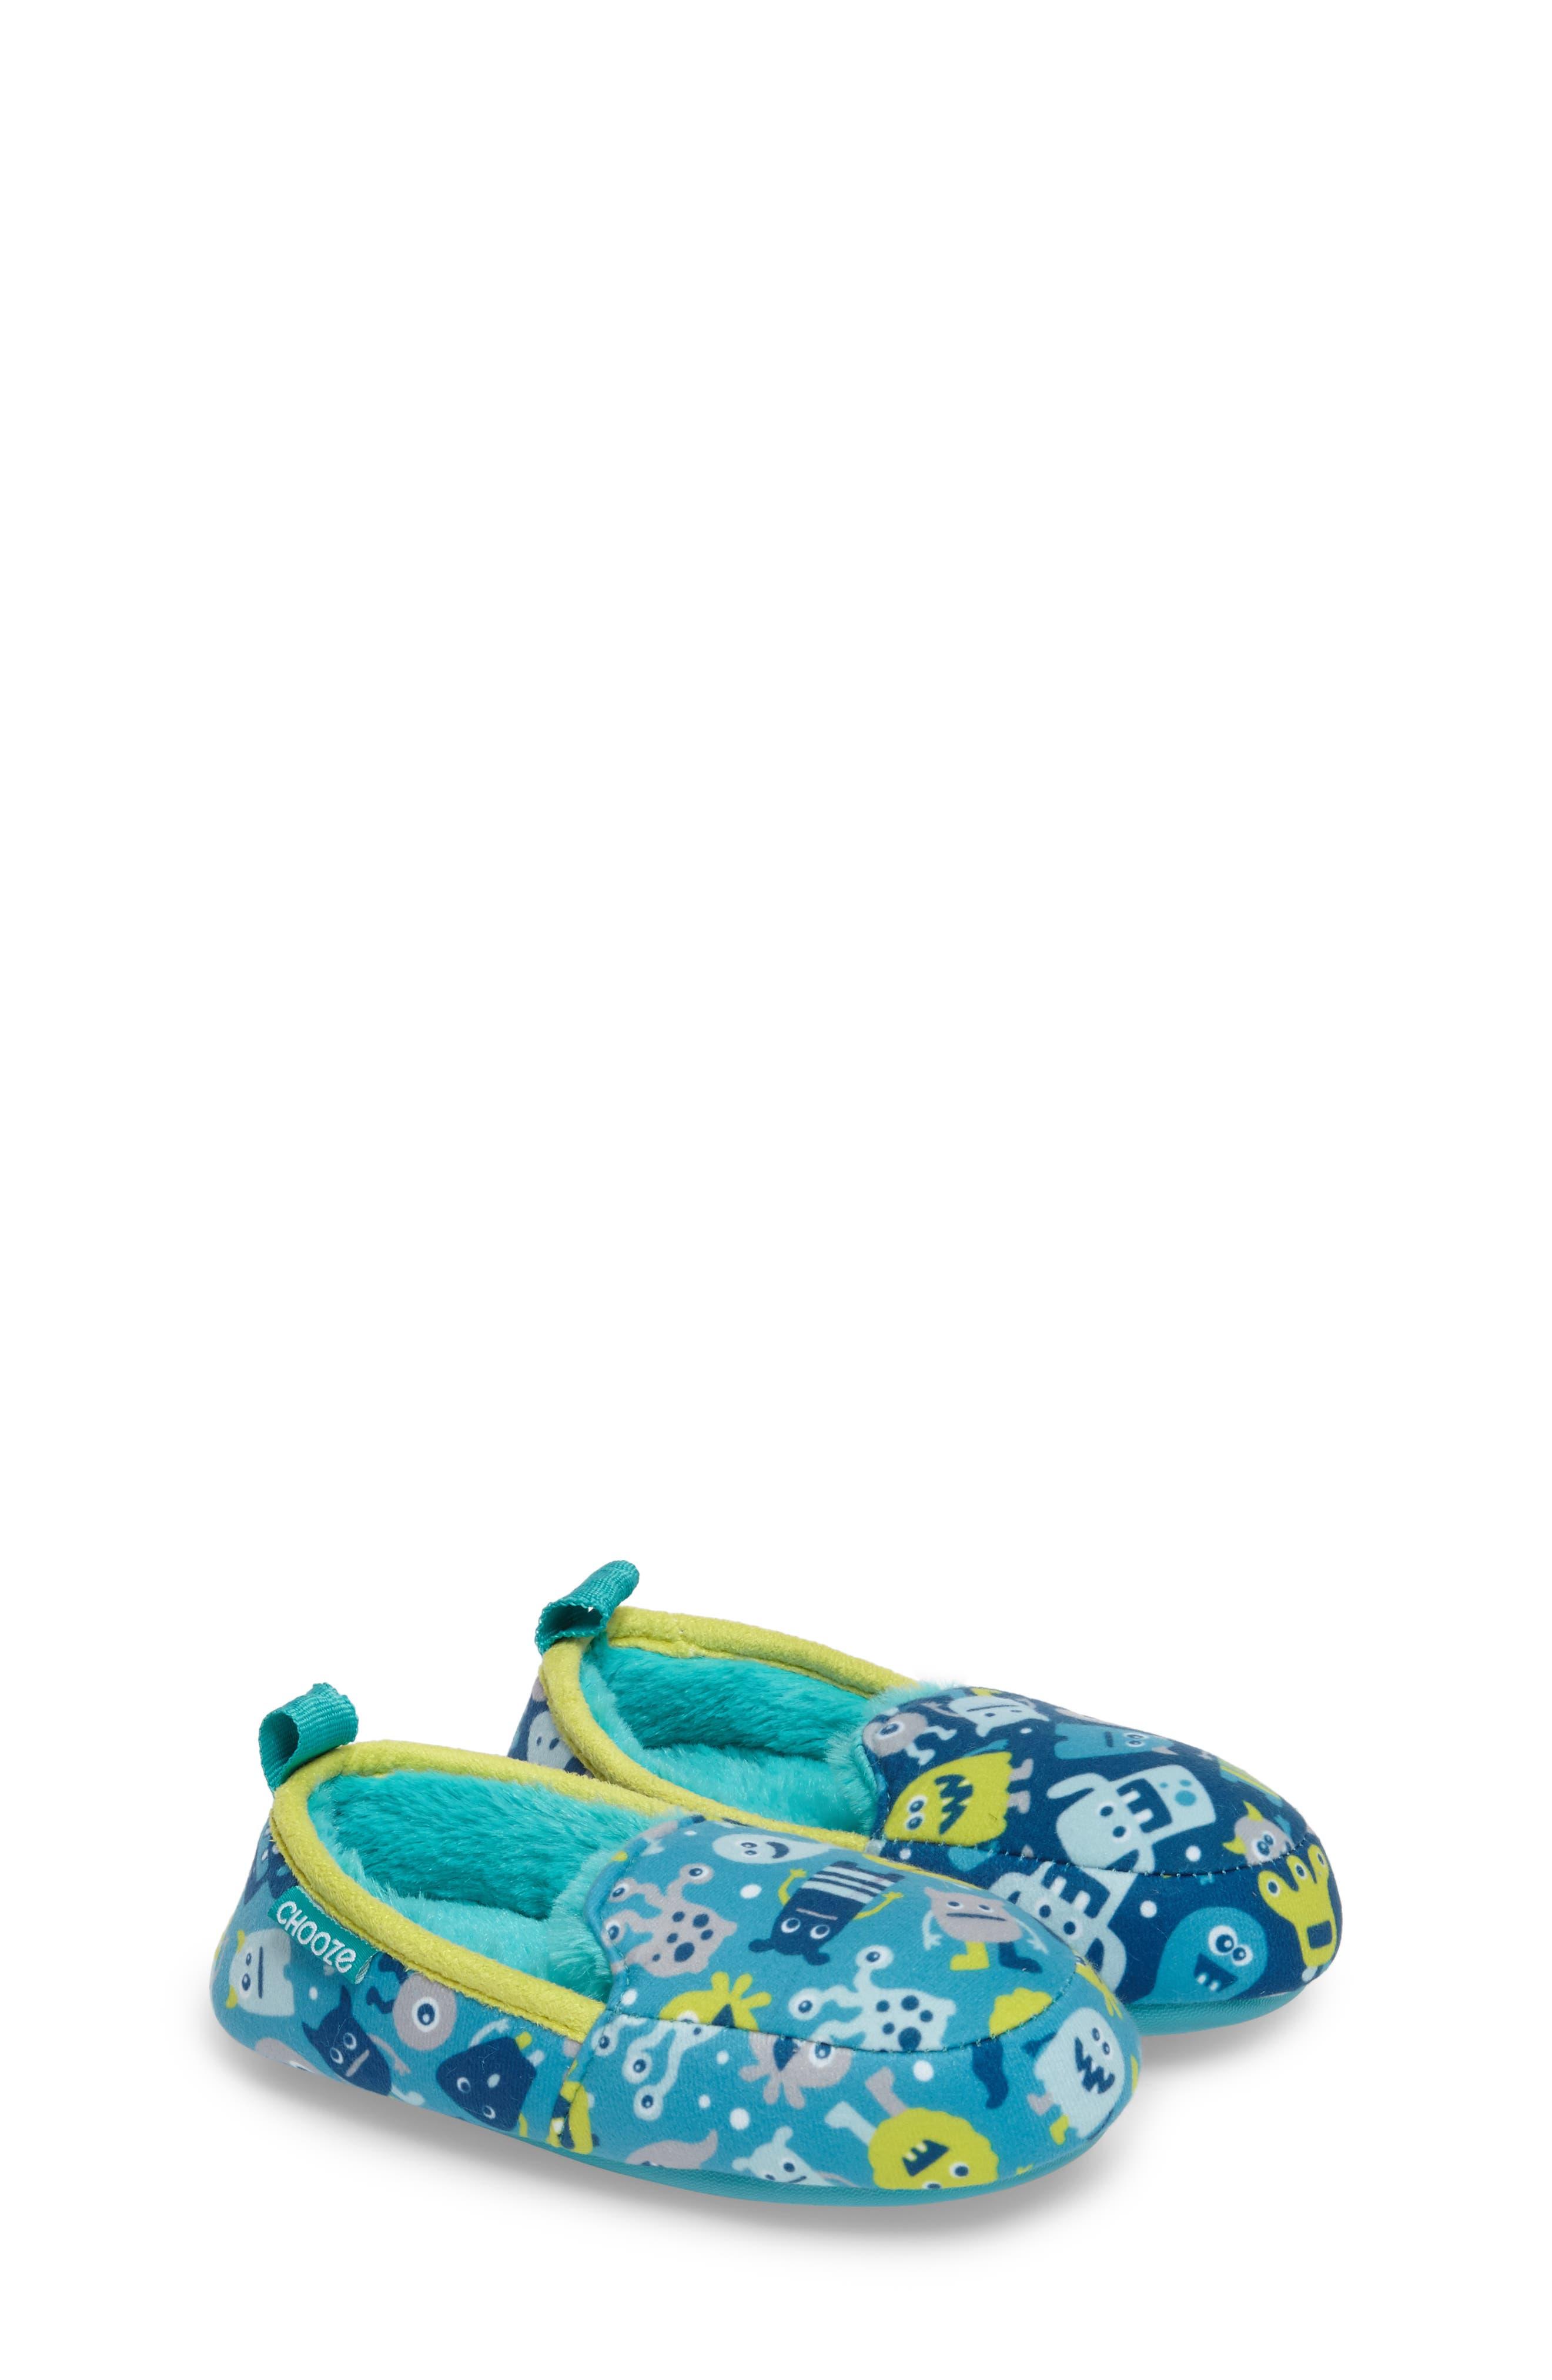 CHOOZE 'Slumber' Slippers (Toddler, Little Kid & Big Kid)